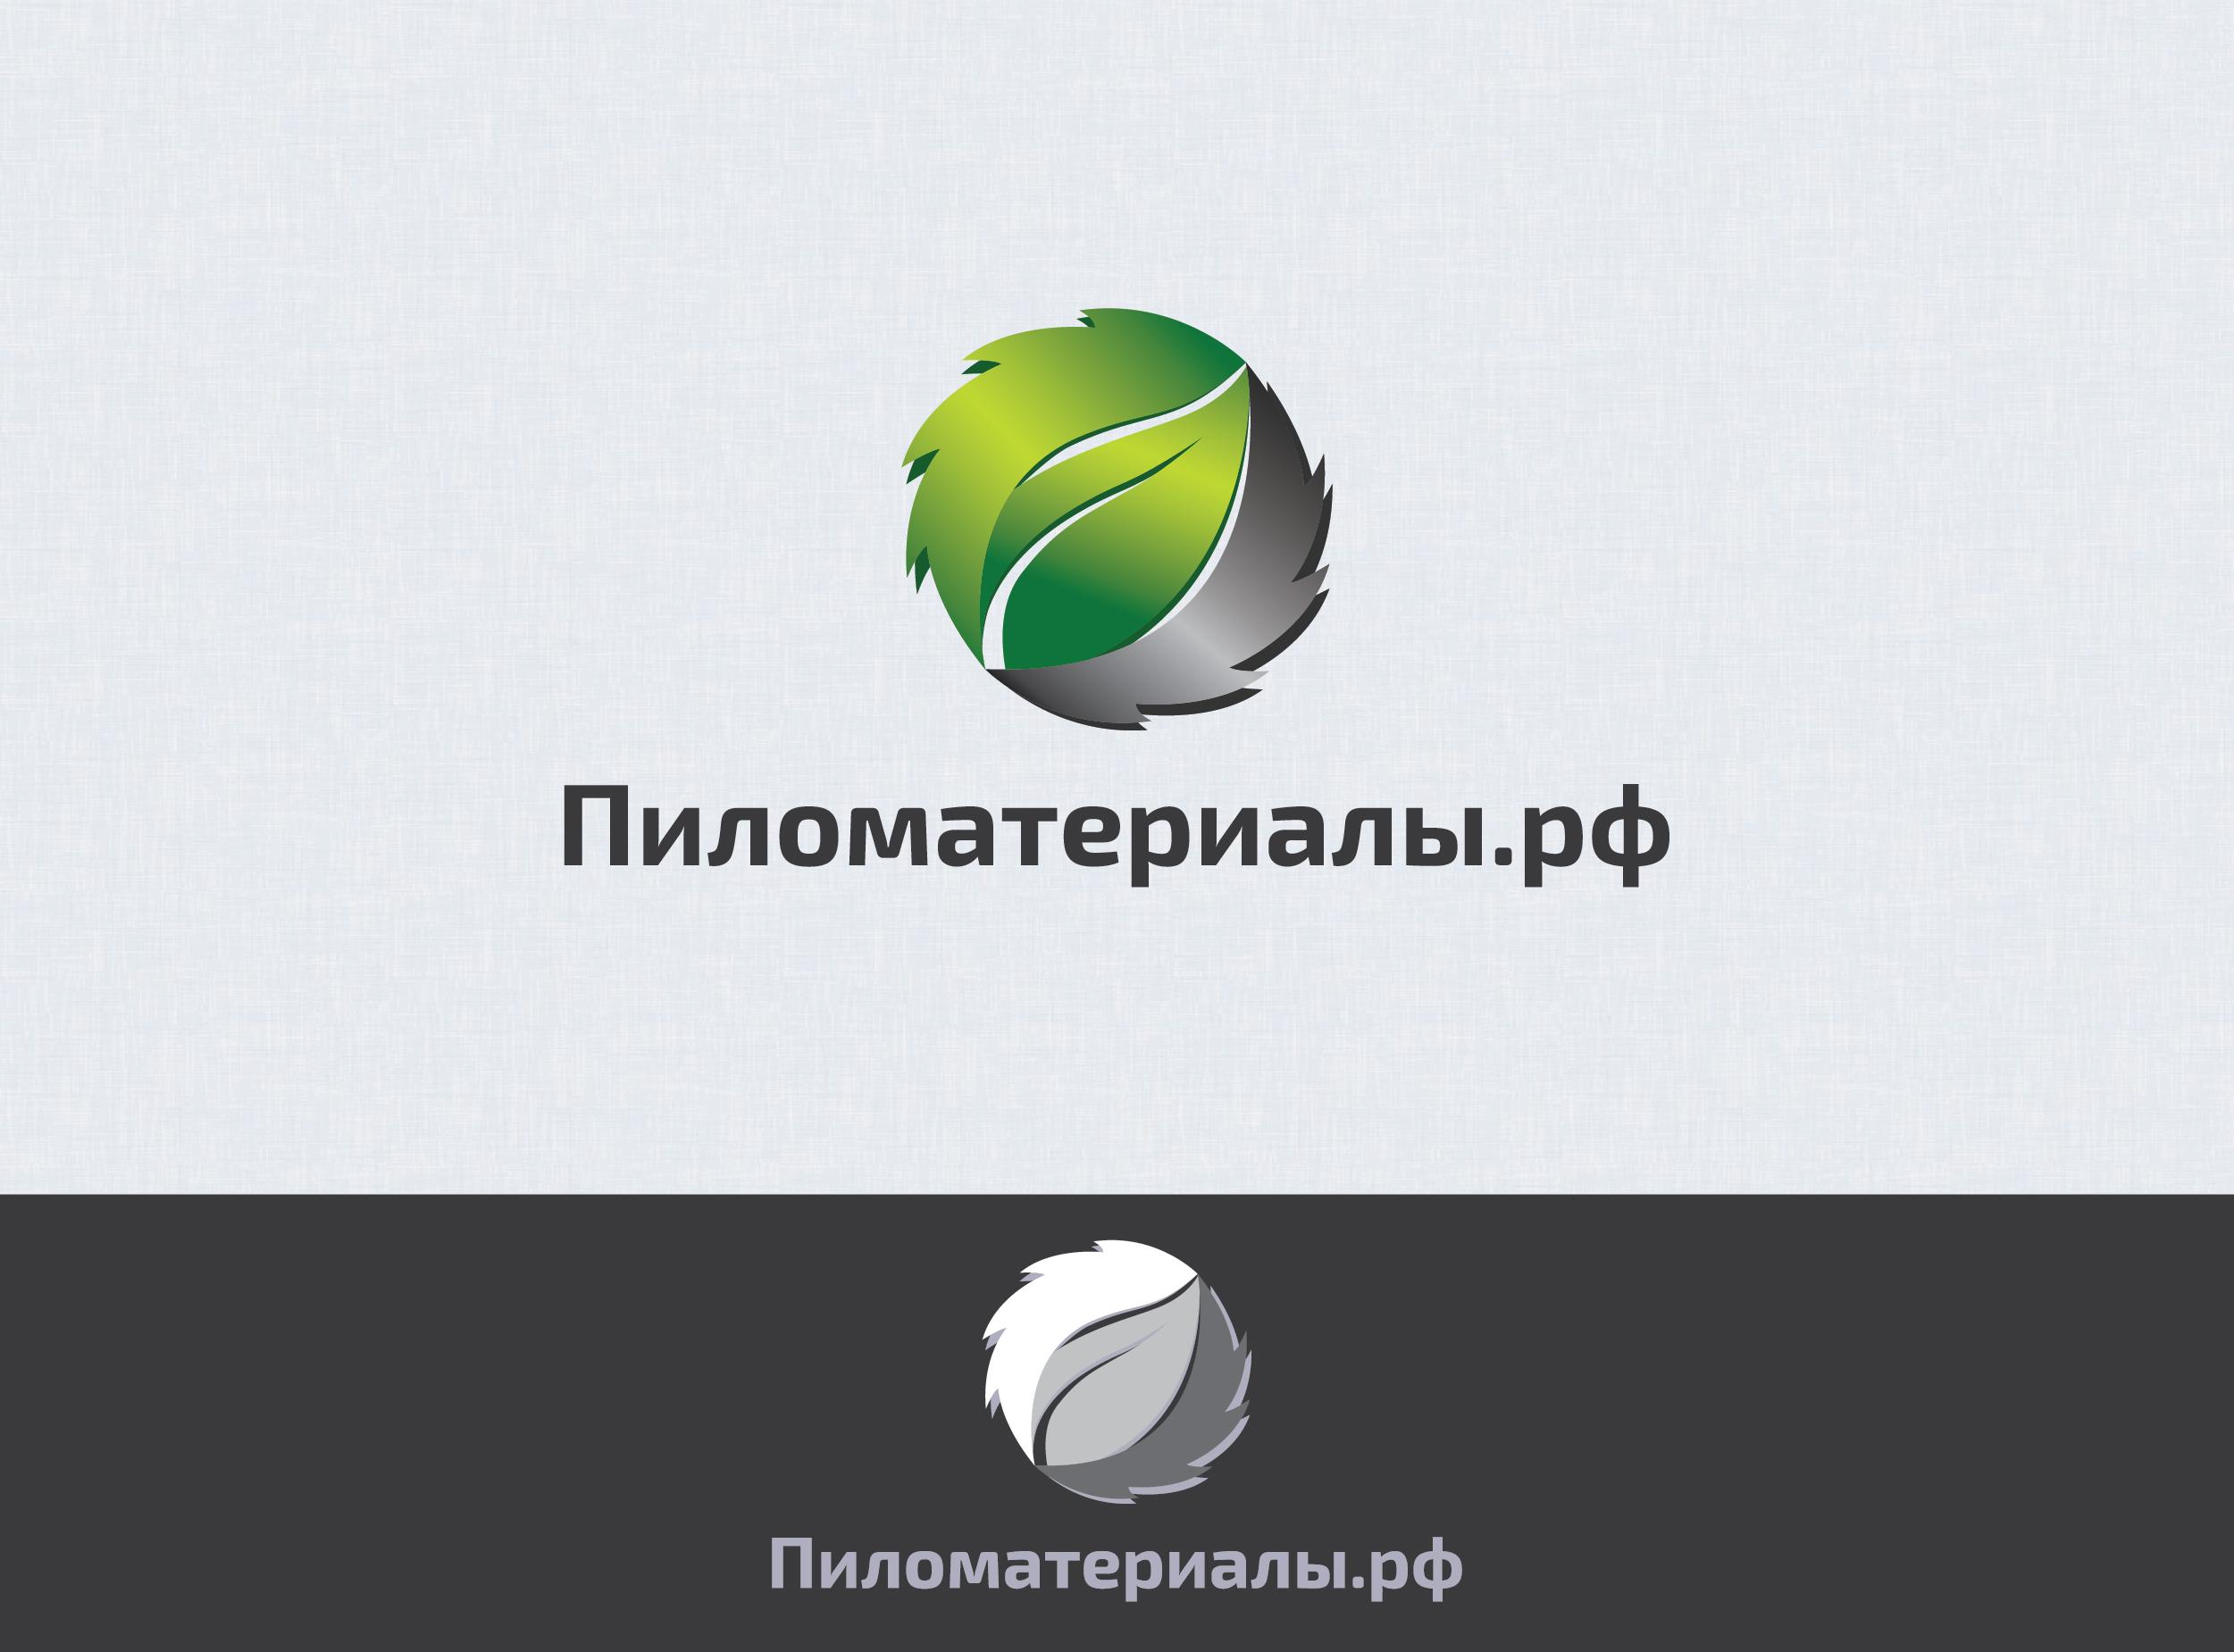 "Создание логотипа и фирменного стиля ""Пиломатериалы.РФ"" фото f_738530f22e4acc93.jpg"